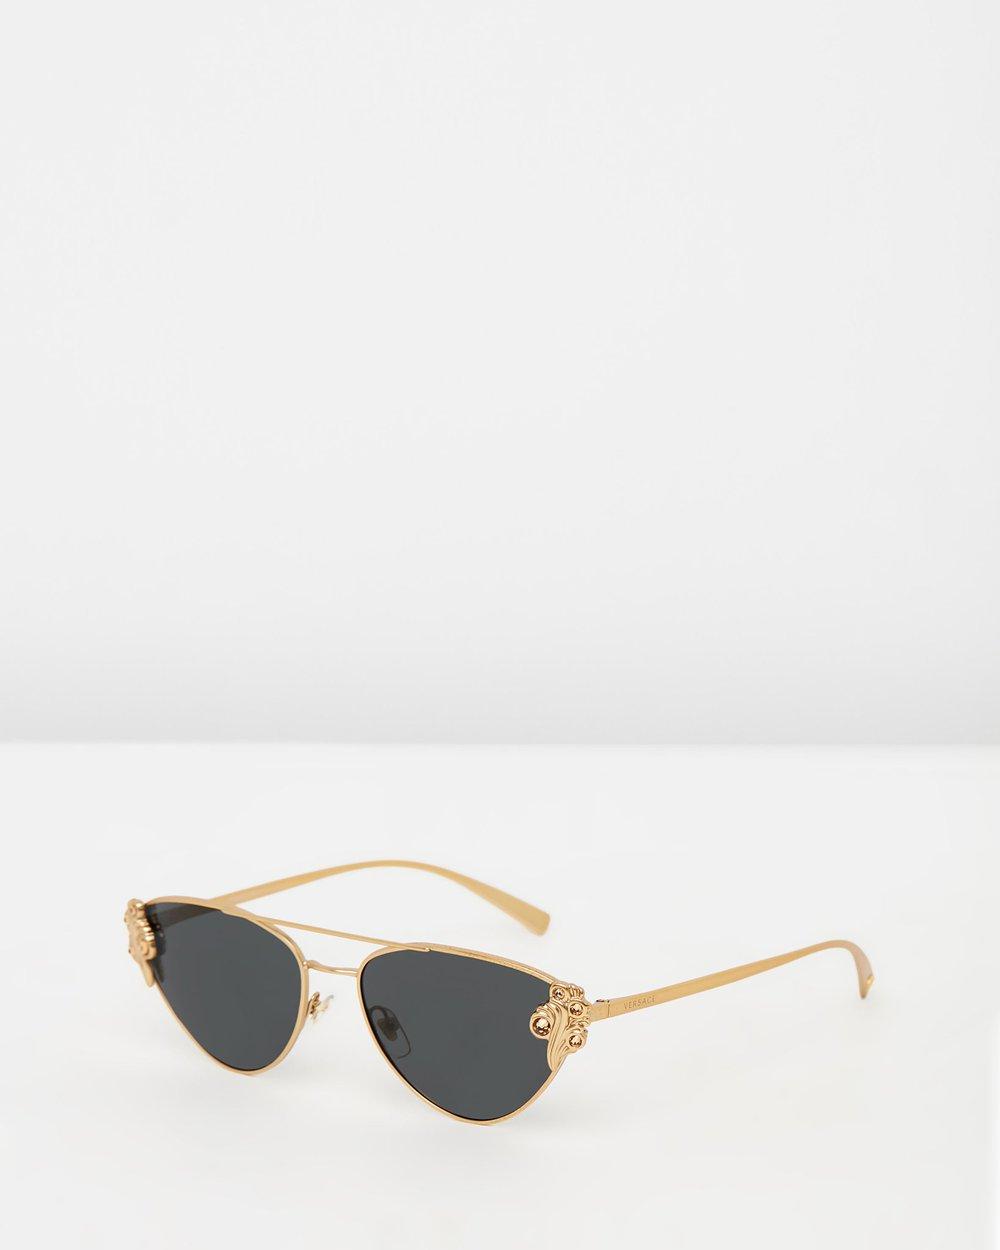 b7fb63e5949c Versace Baroccomania Sunglasses by Versace Online